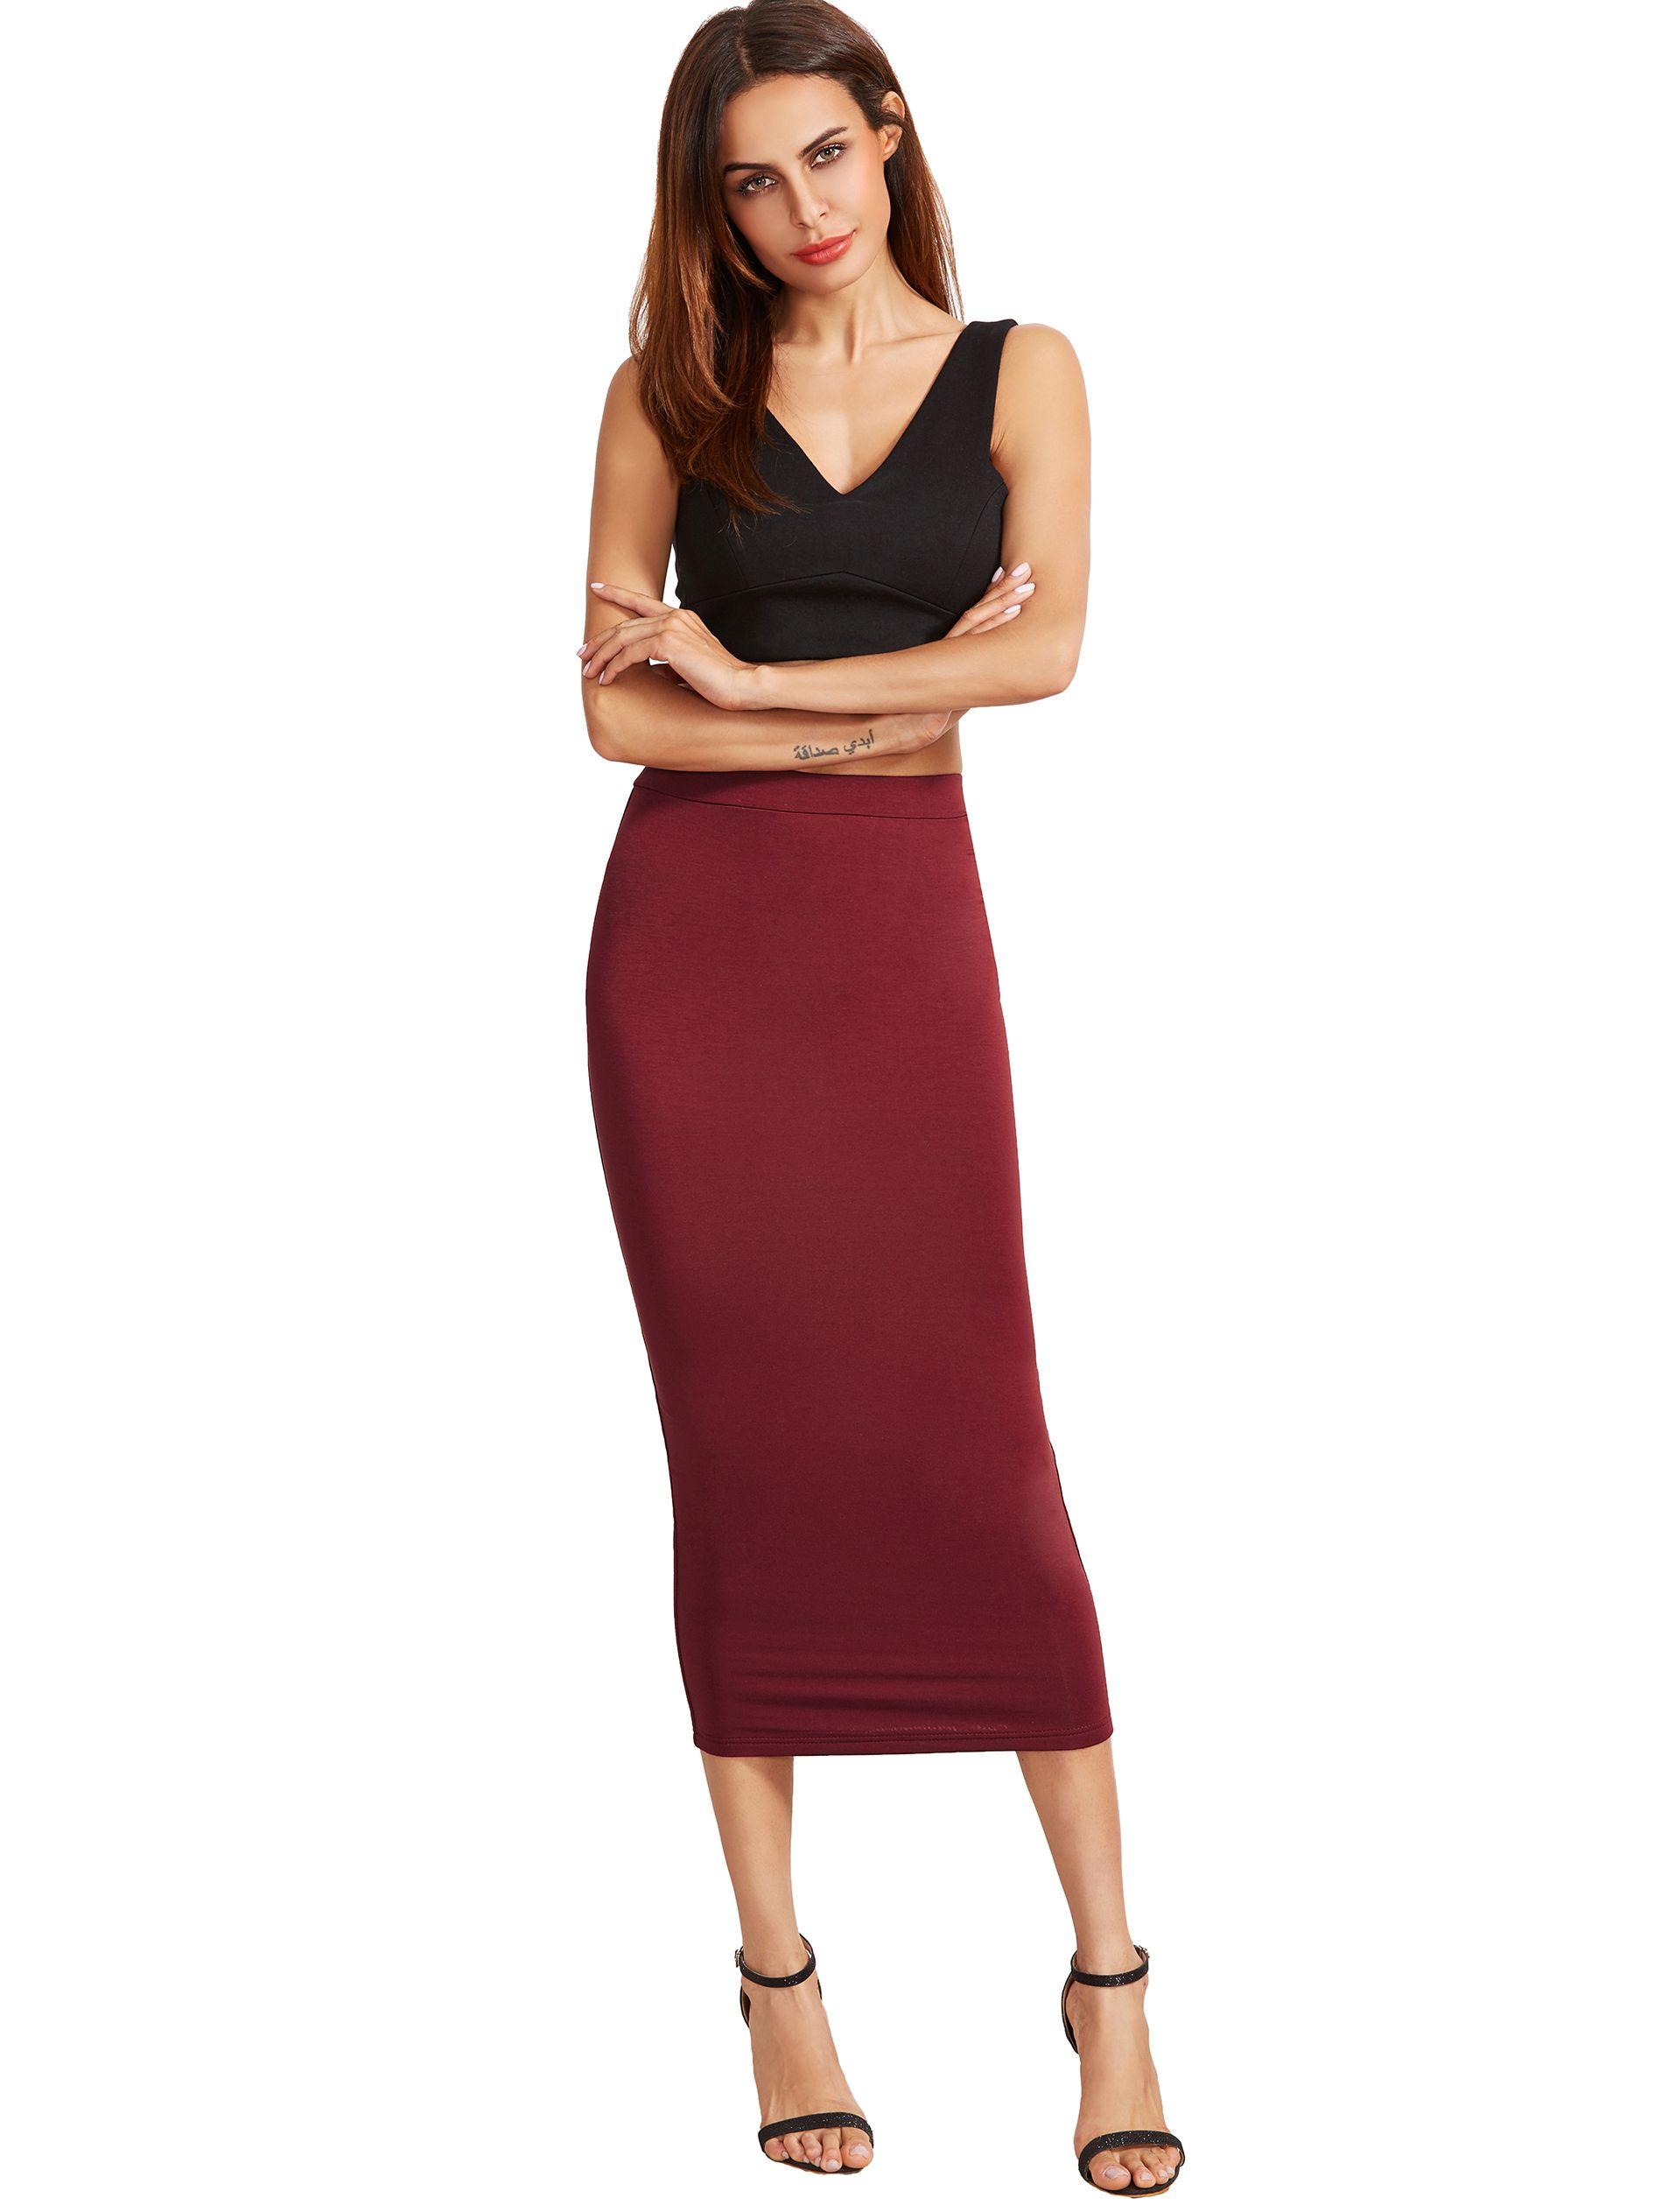 99c0d12065 Burgundy High Waist Sheath Skirt -SheIn(Sheinside) | :: >> Just ...